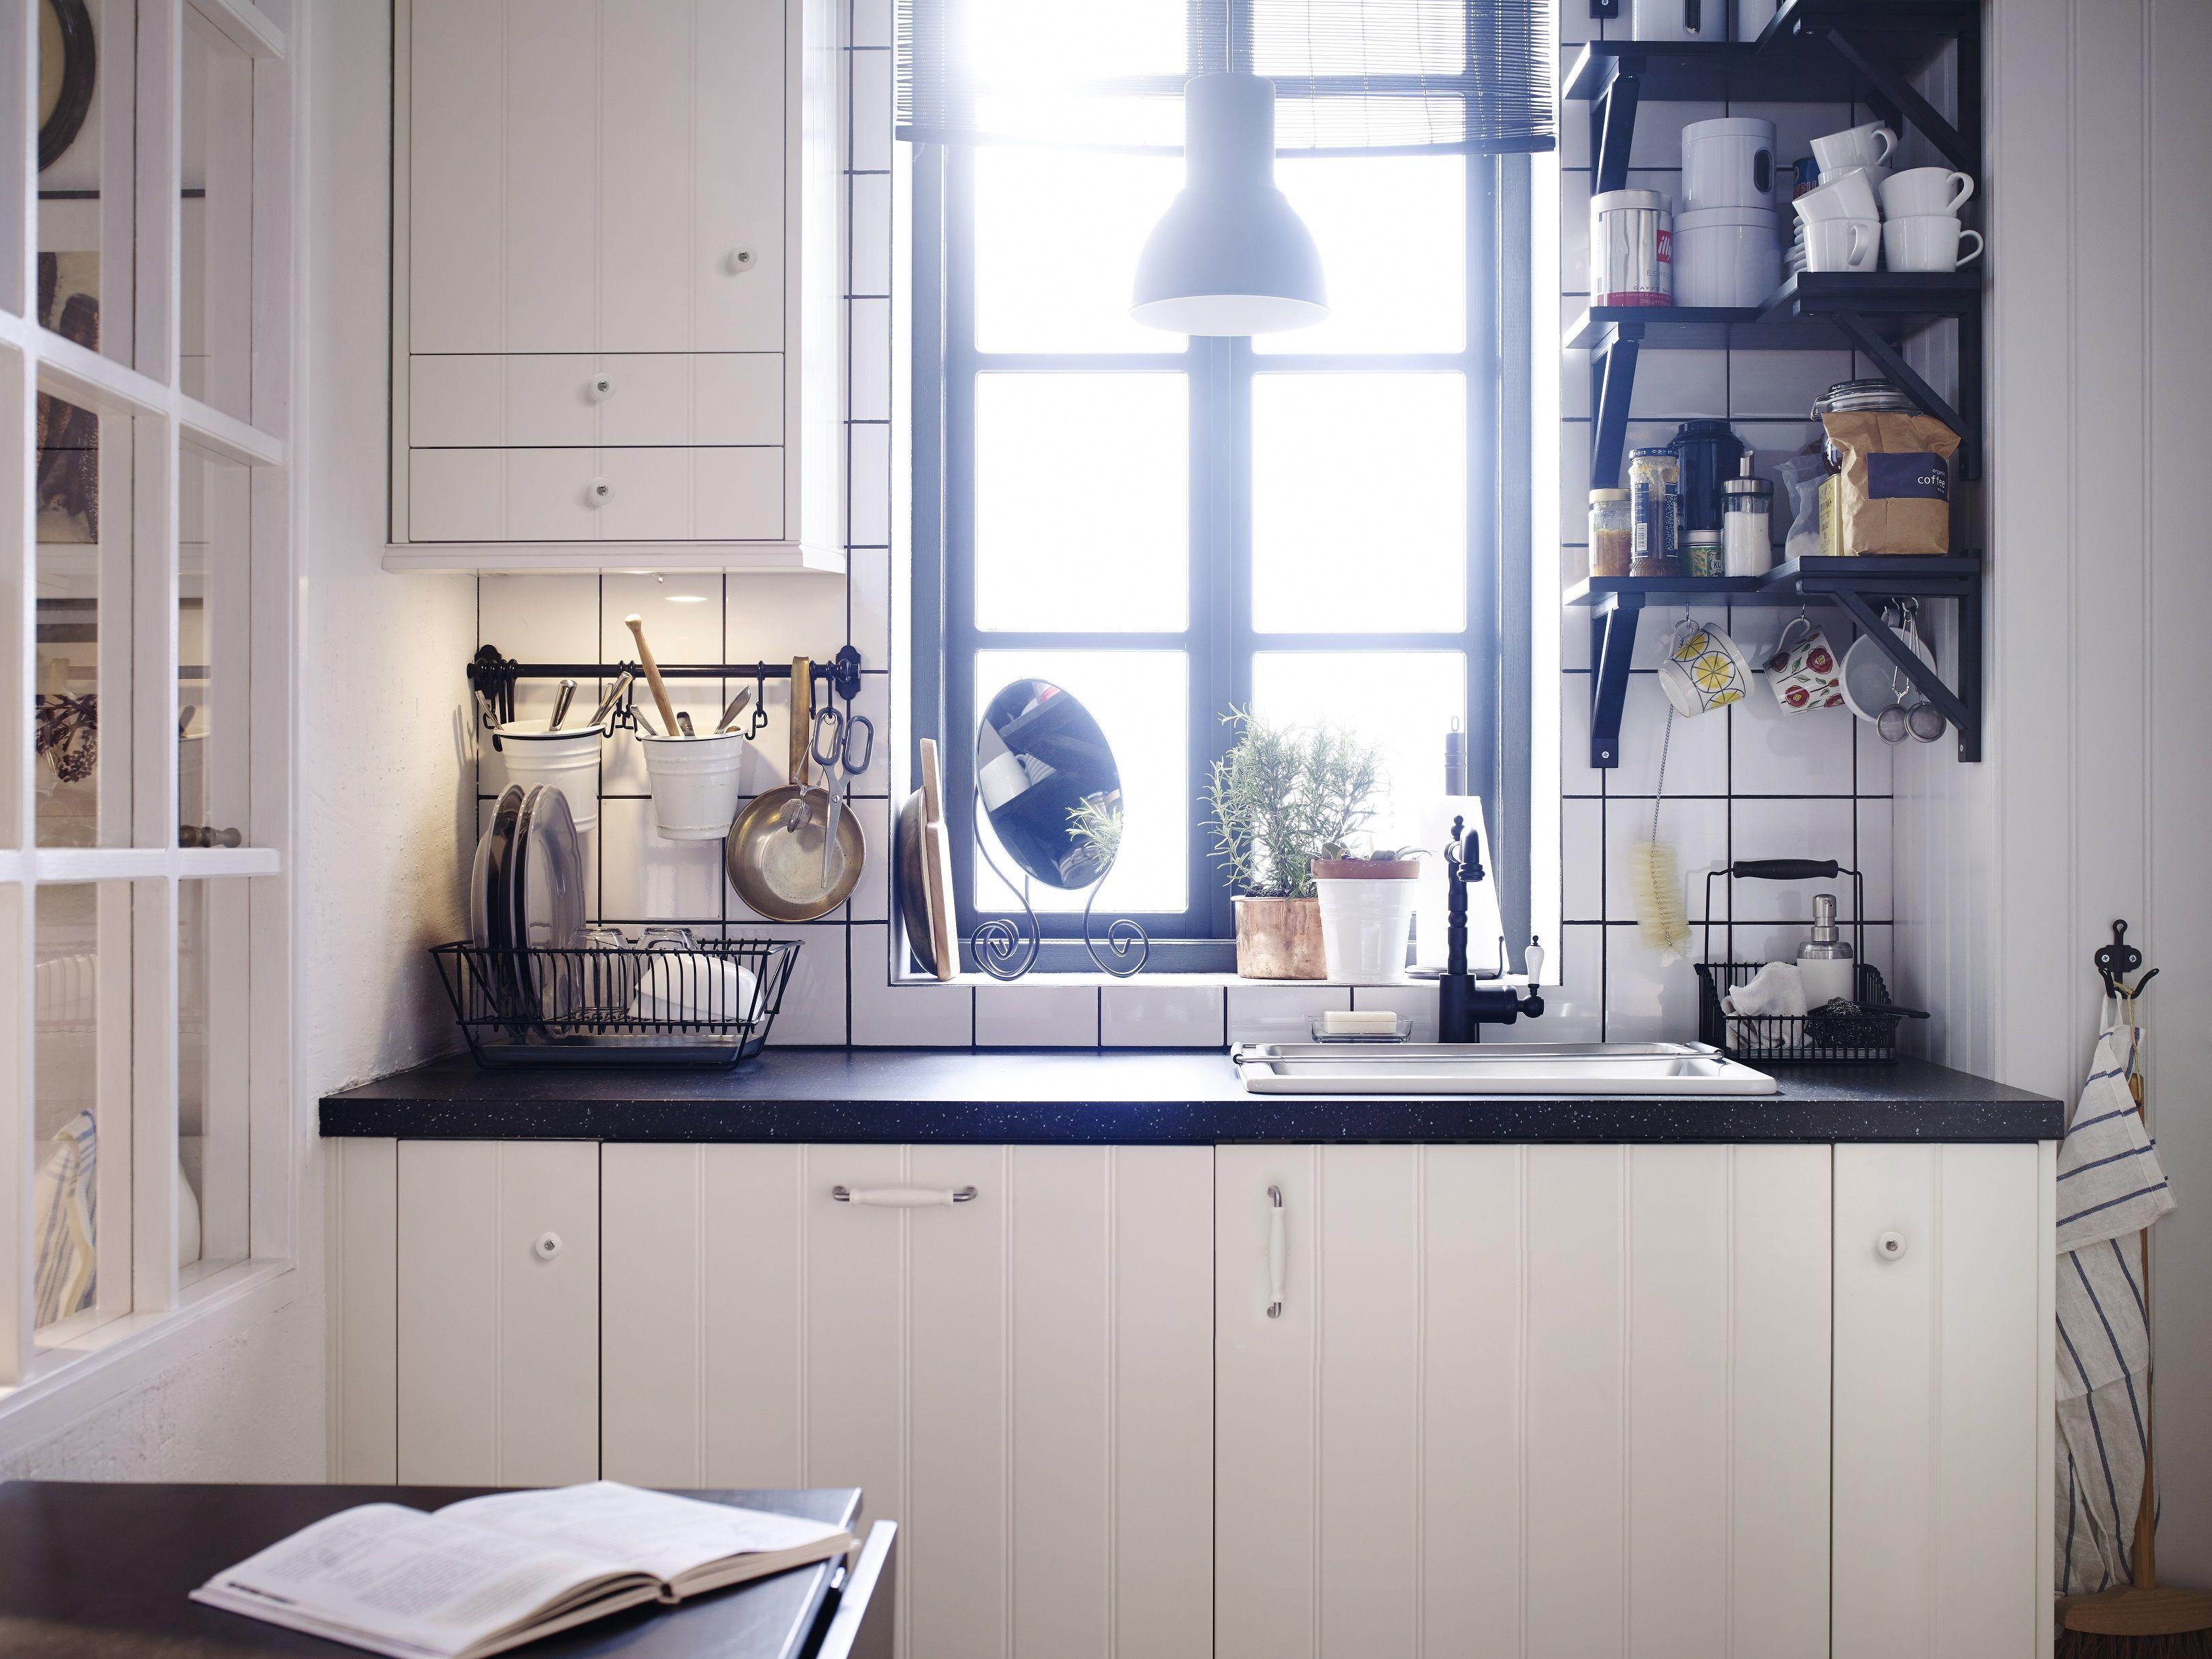 Hittarp deur ecru first flat u003c3 pinterest kitchen ikea and